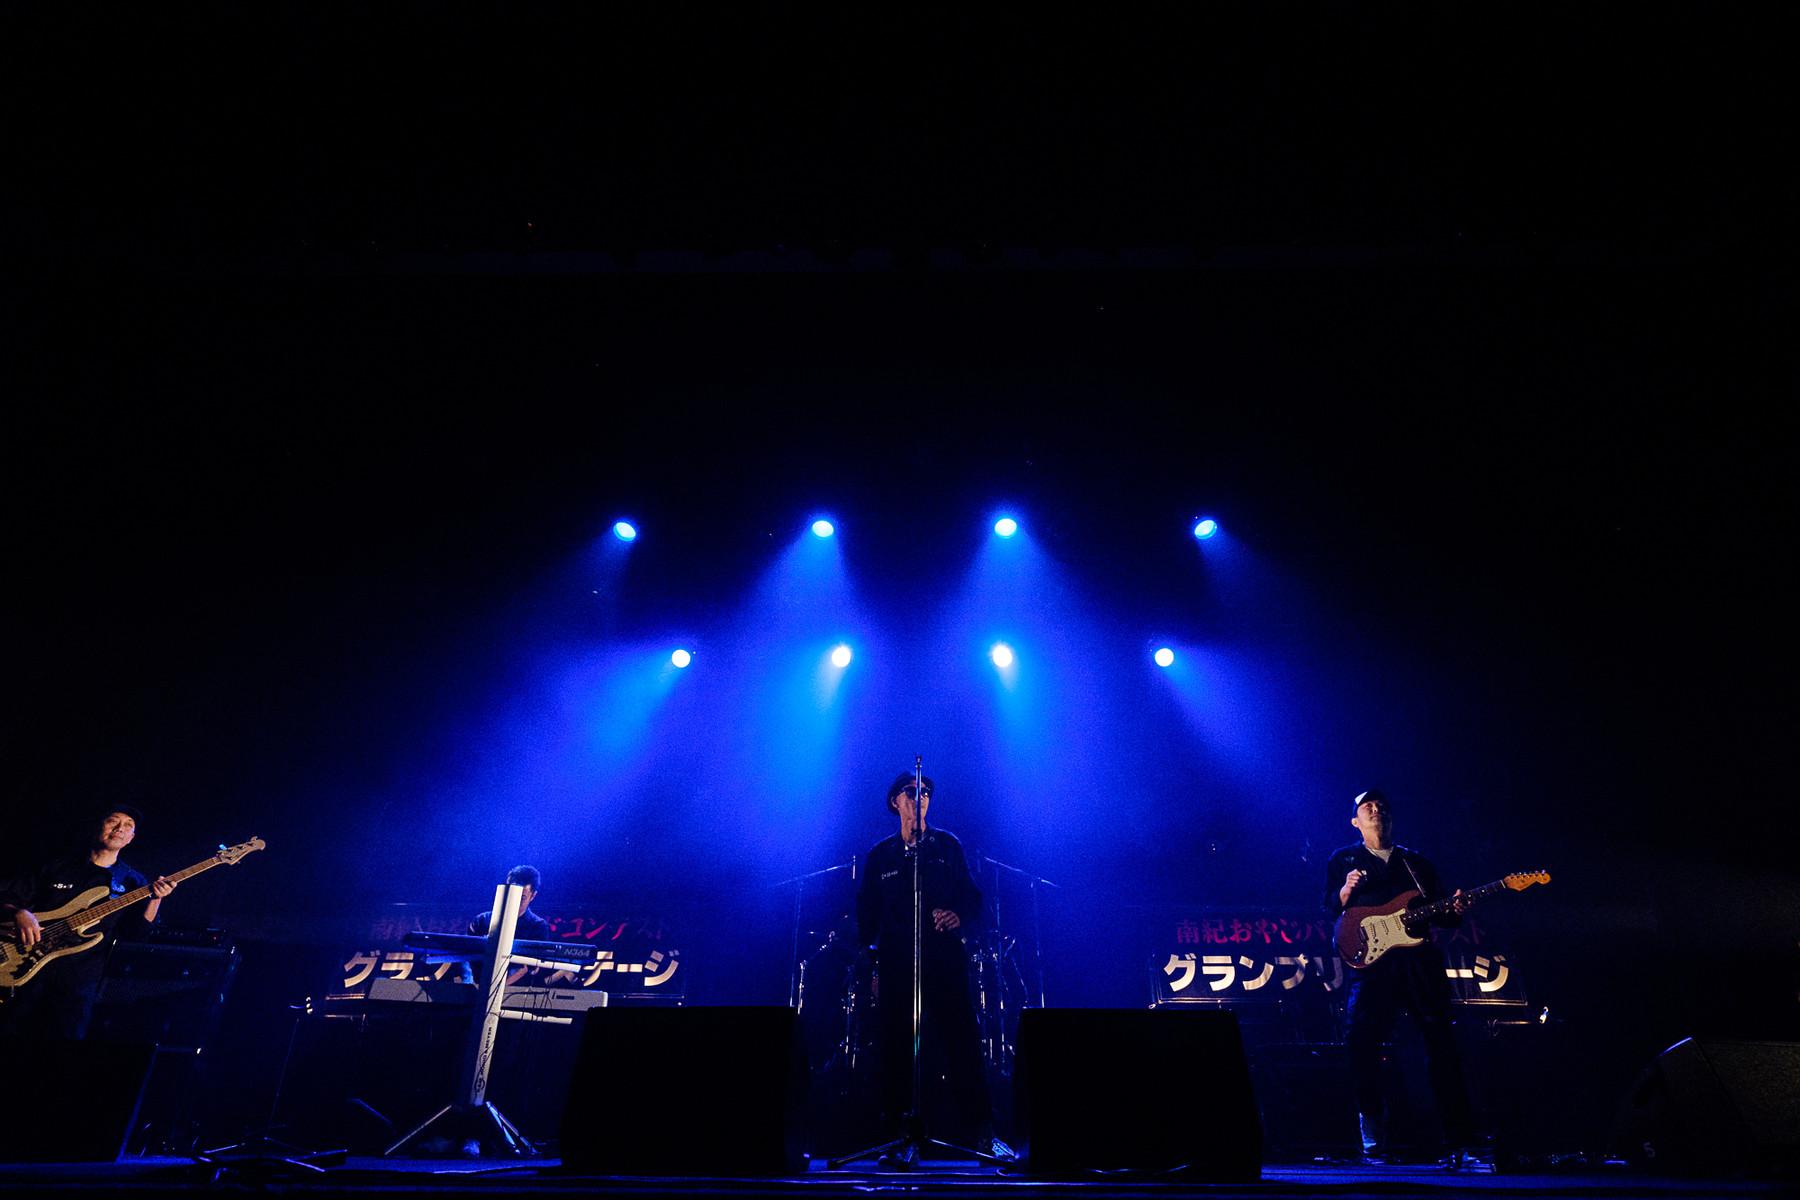 crowstarsband-1